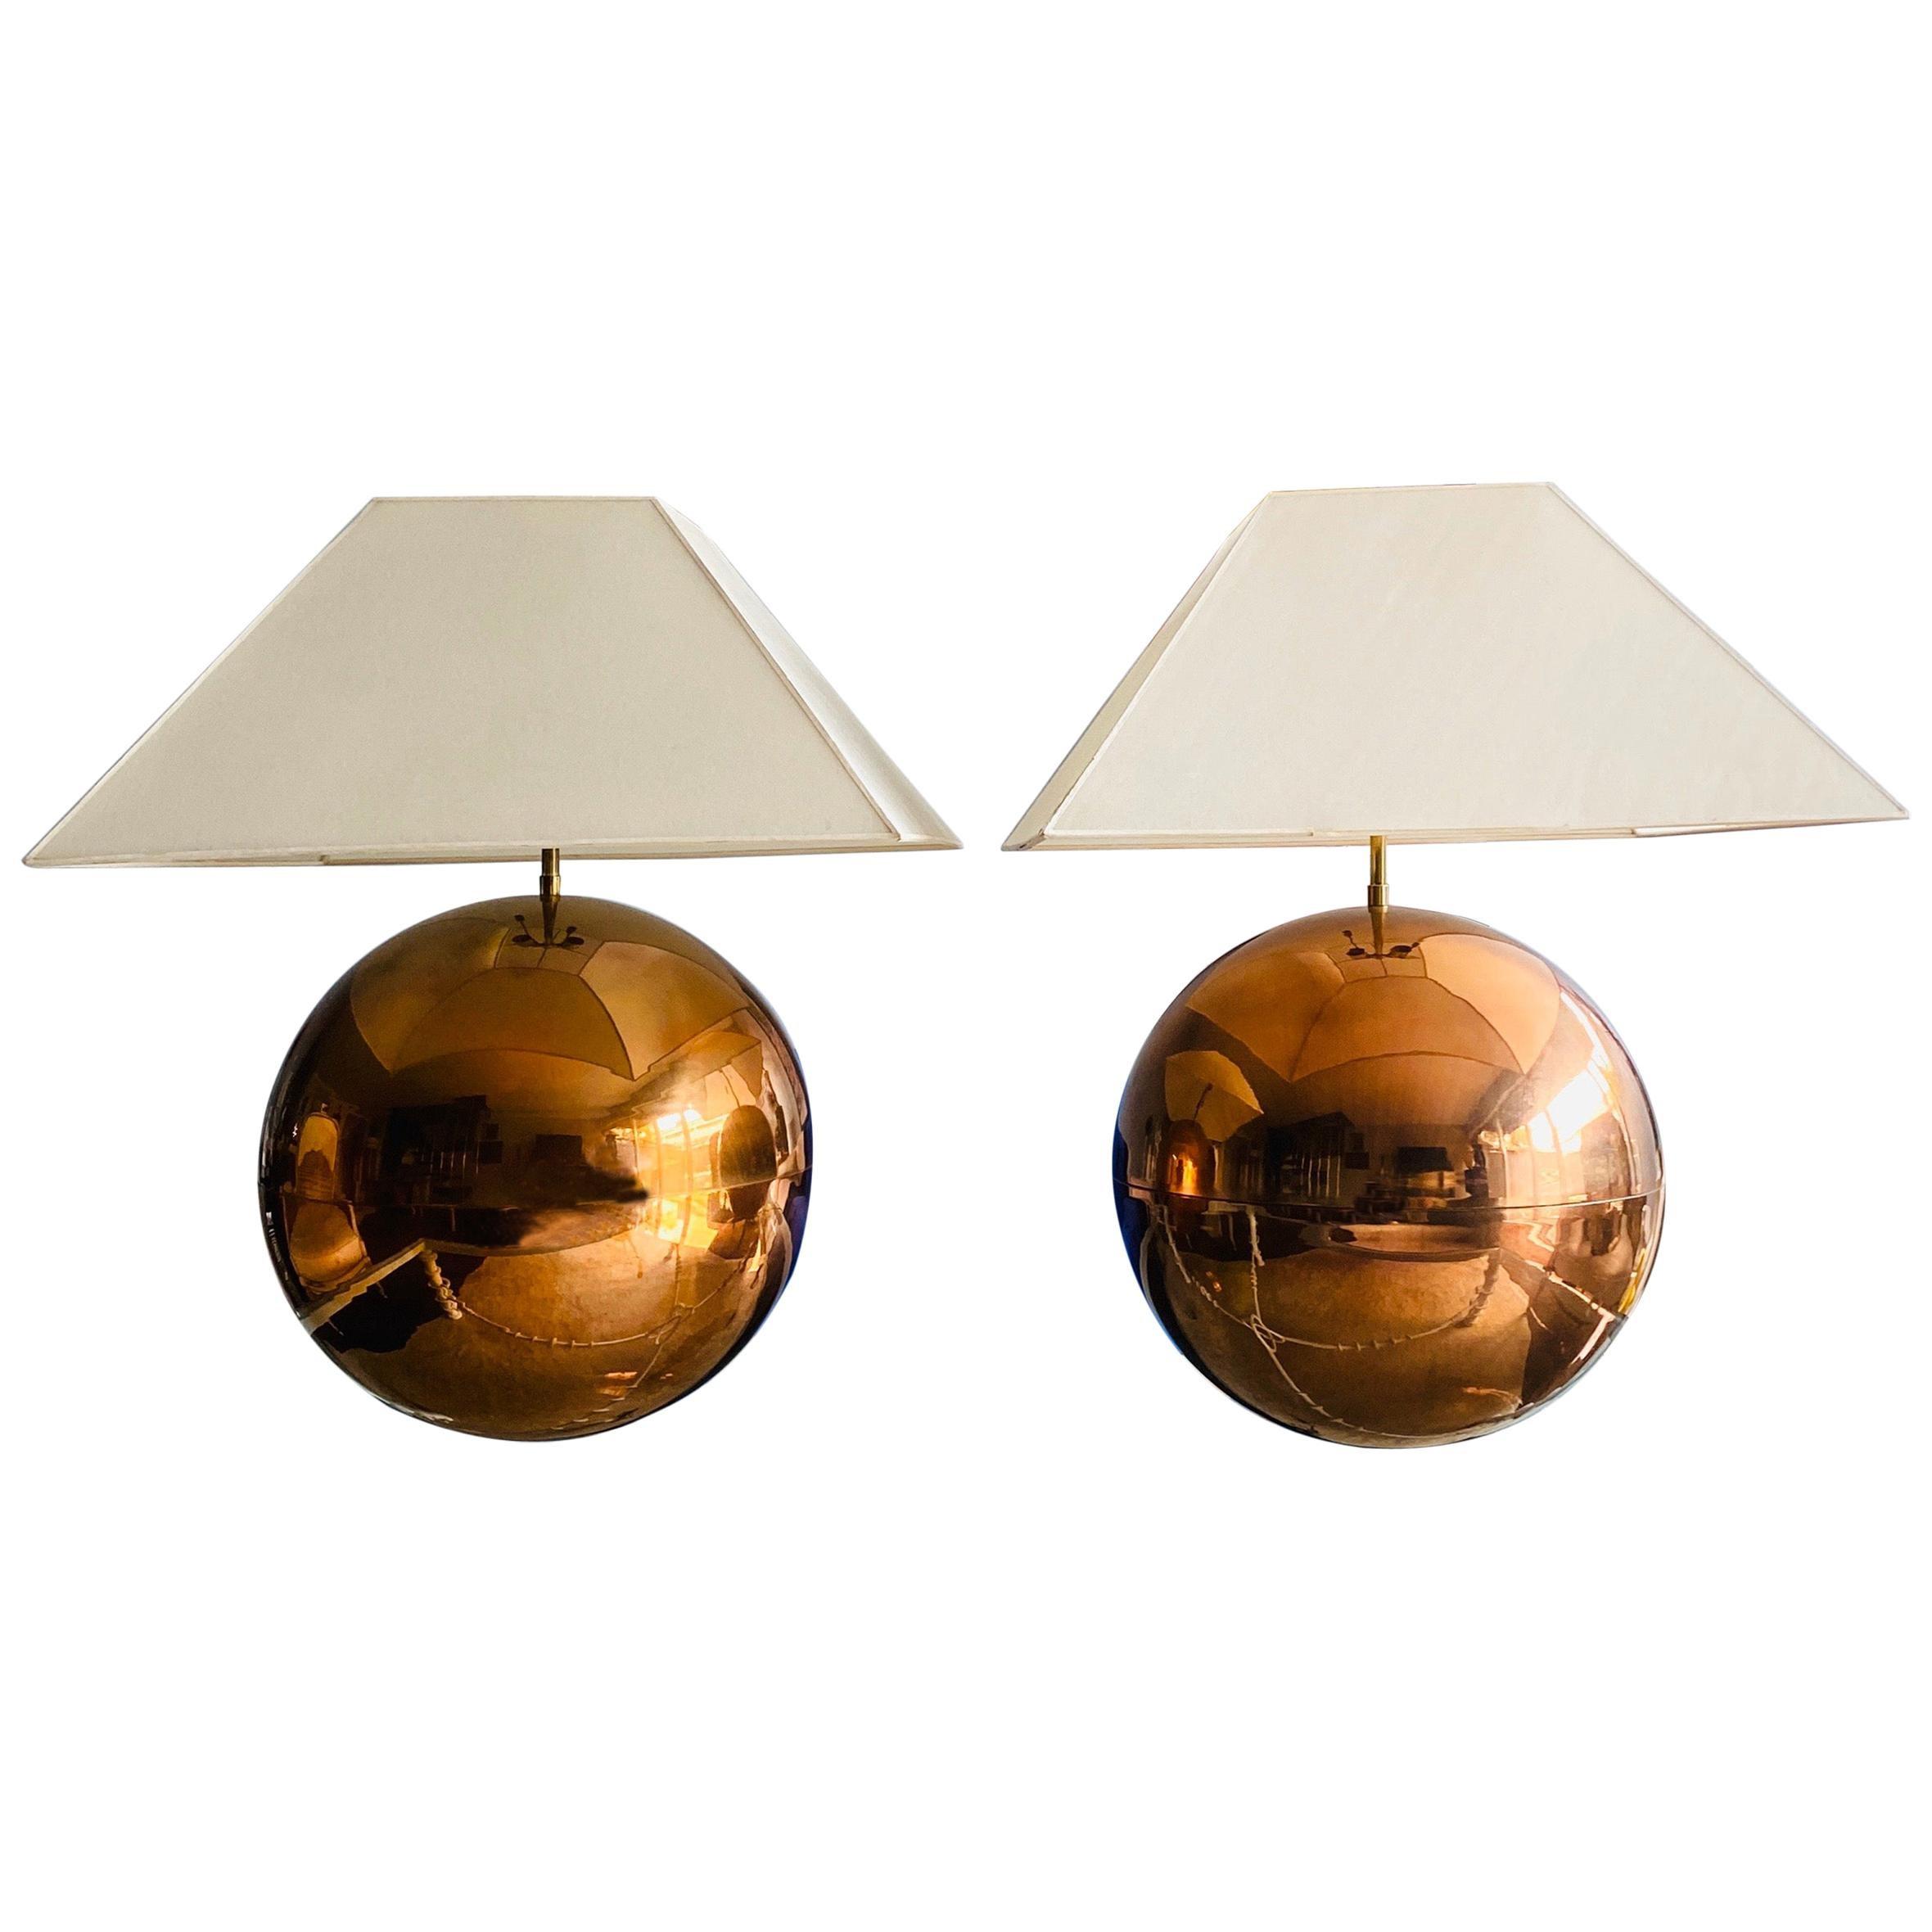 Pair of Karl Springer Metal Ball Lamp